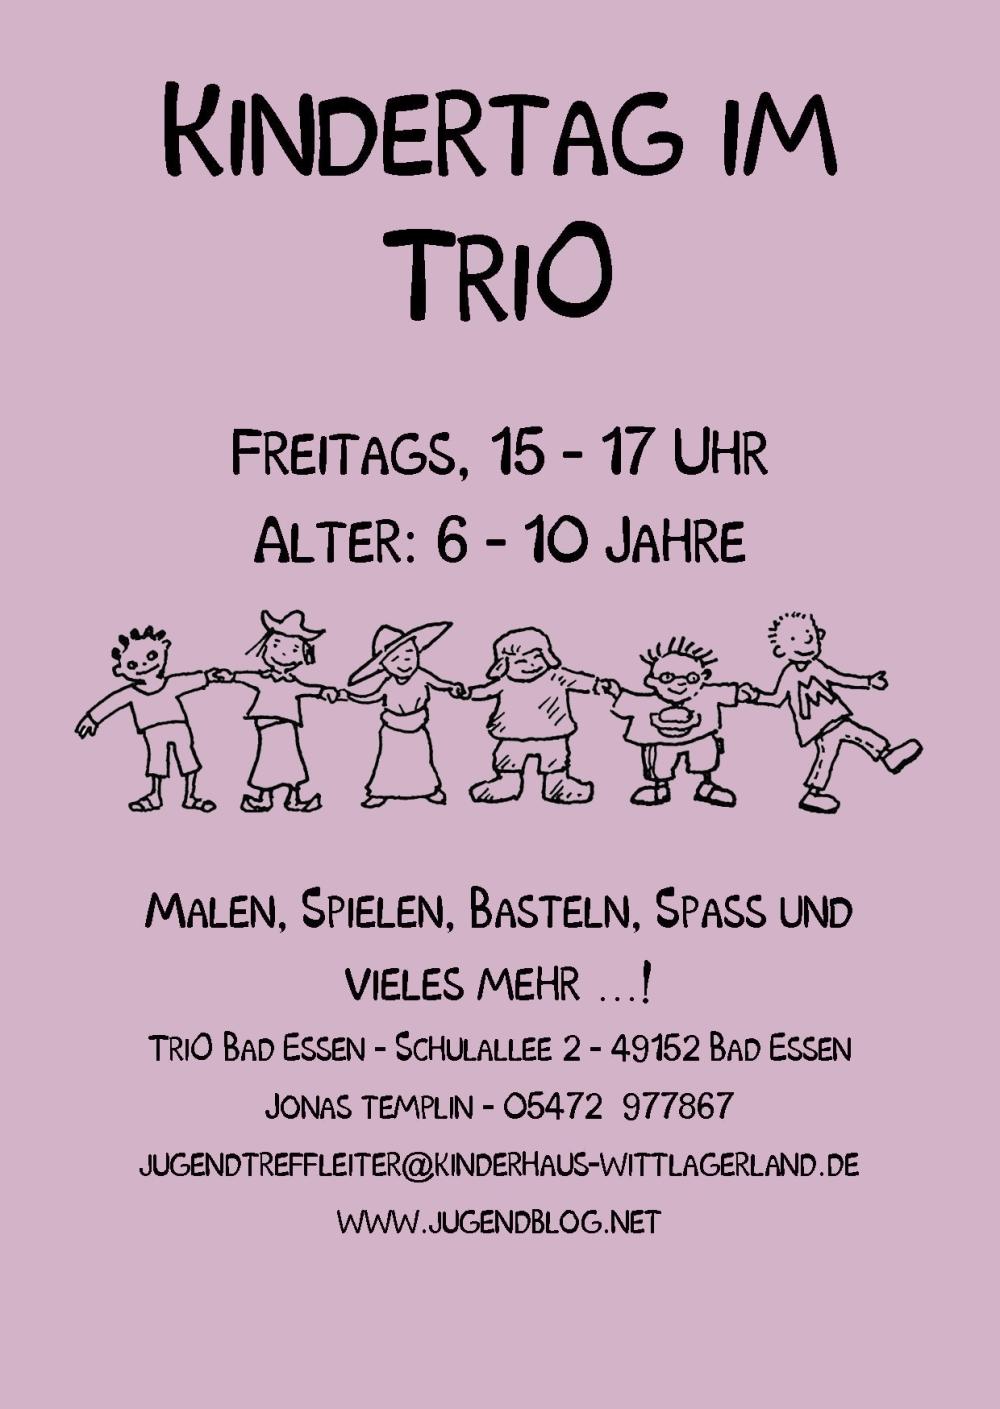 Kindertag TriO Front Publisher 01 WEB